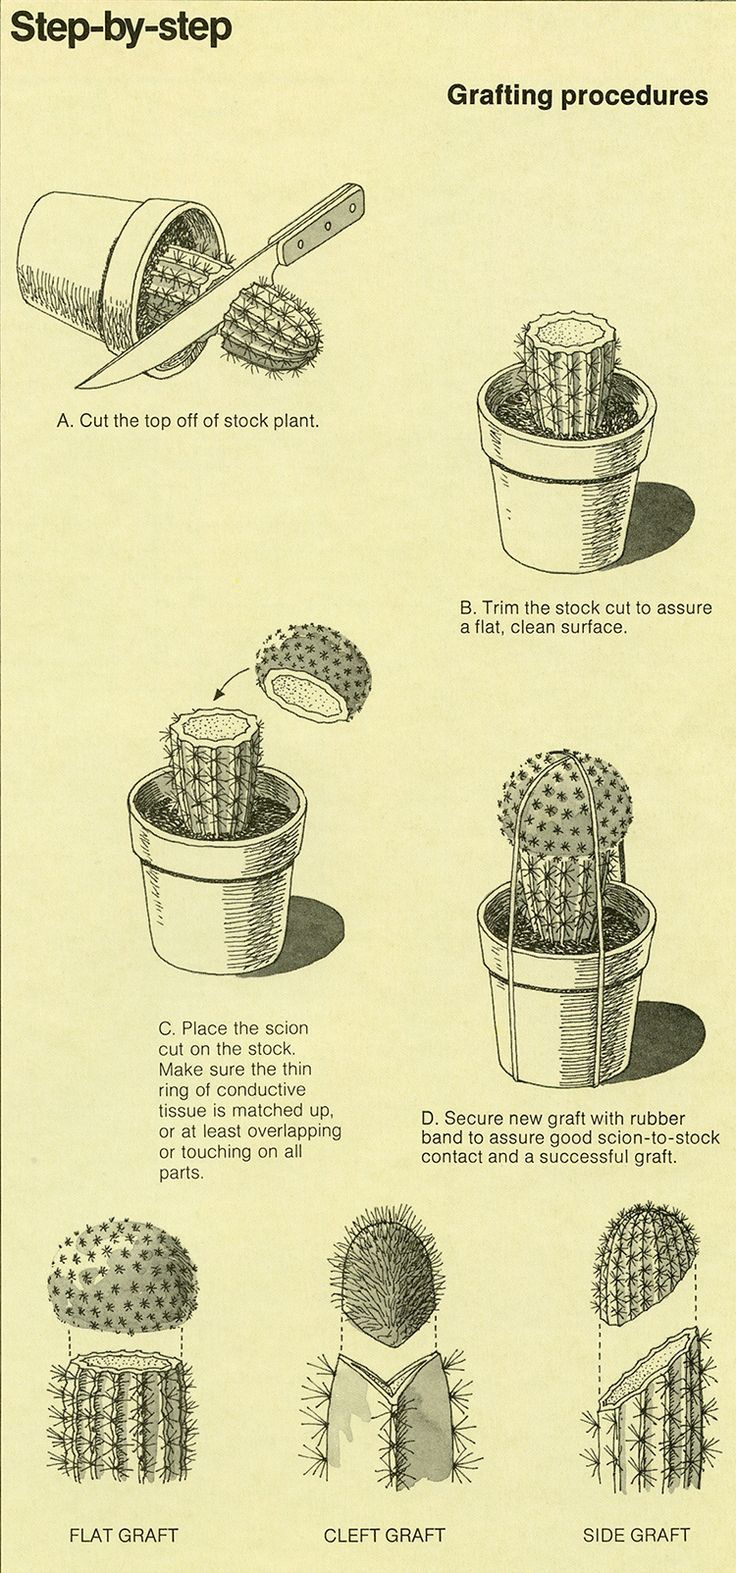 1ff3b2725dab16994876e1b1aceffff9 Jpg 736 1 573 Pixels Plants Planting Succulents Cactus